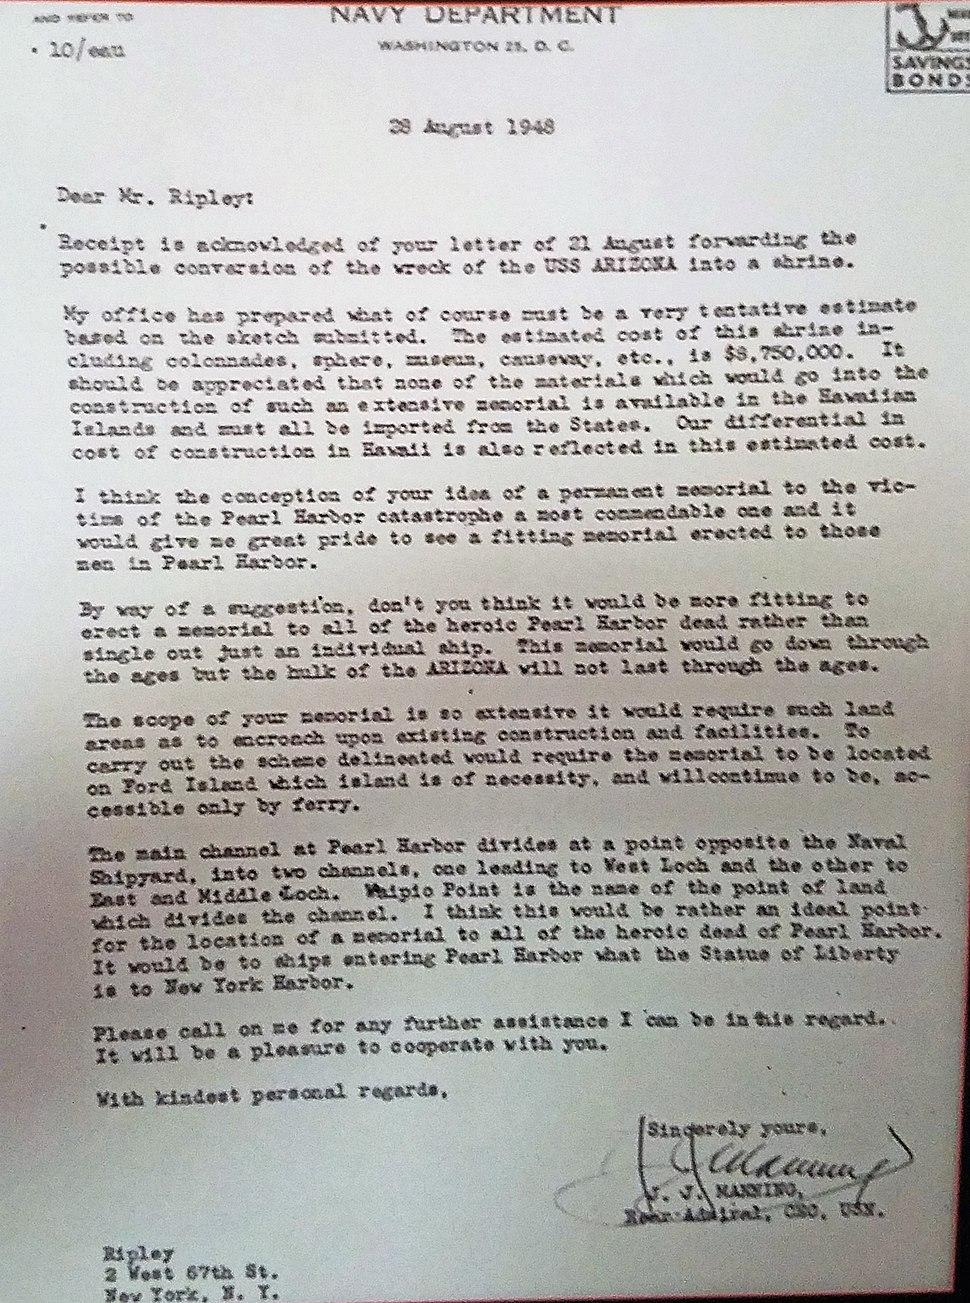 Letter from RADM J.J. Manning to Robert Ripley